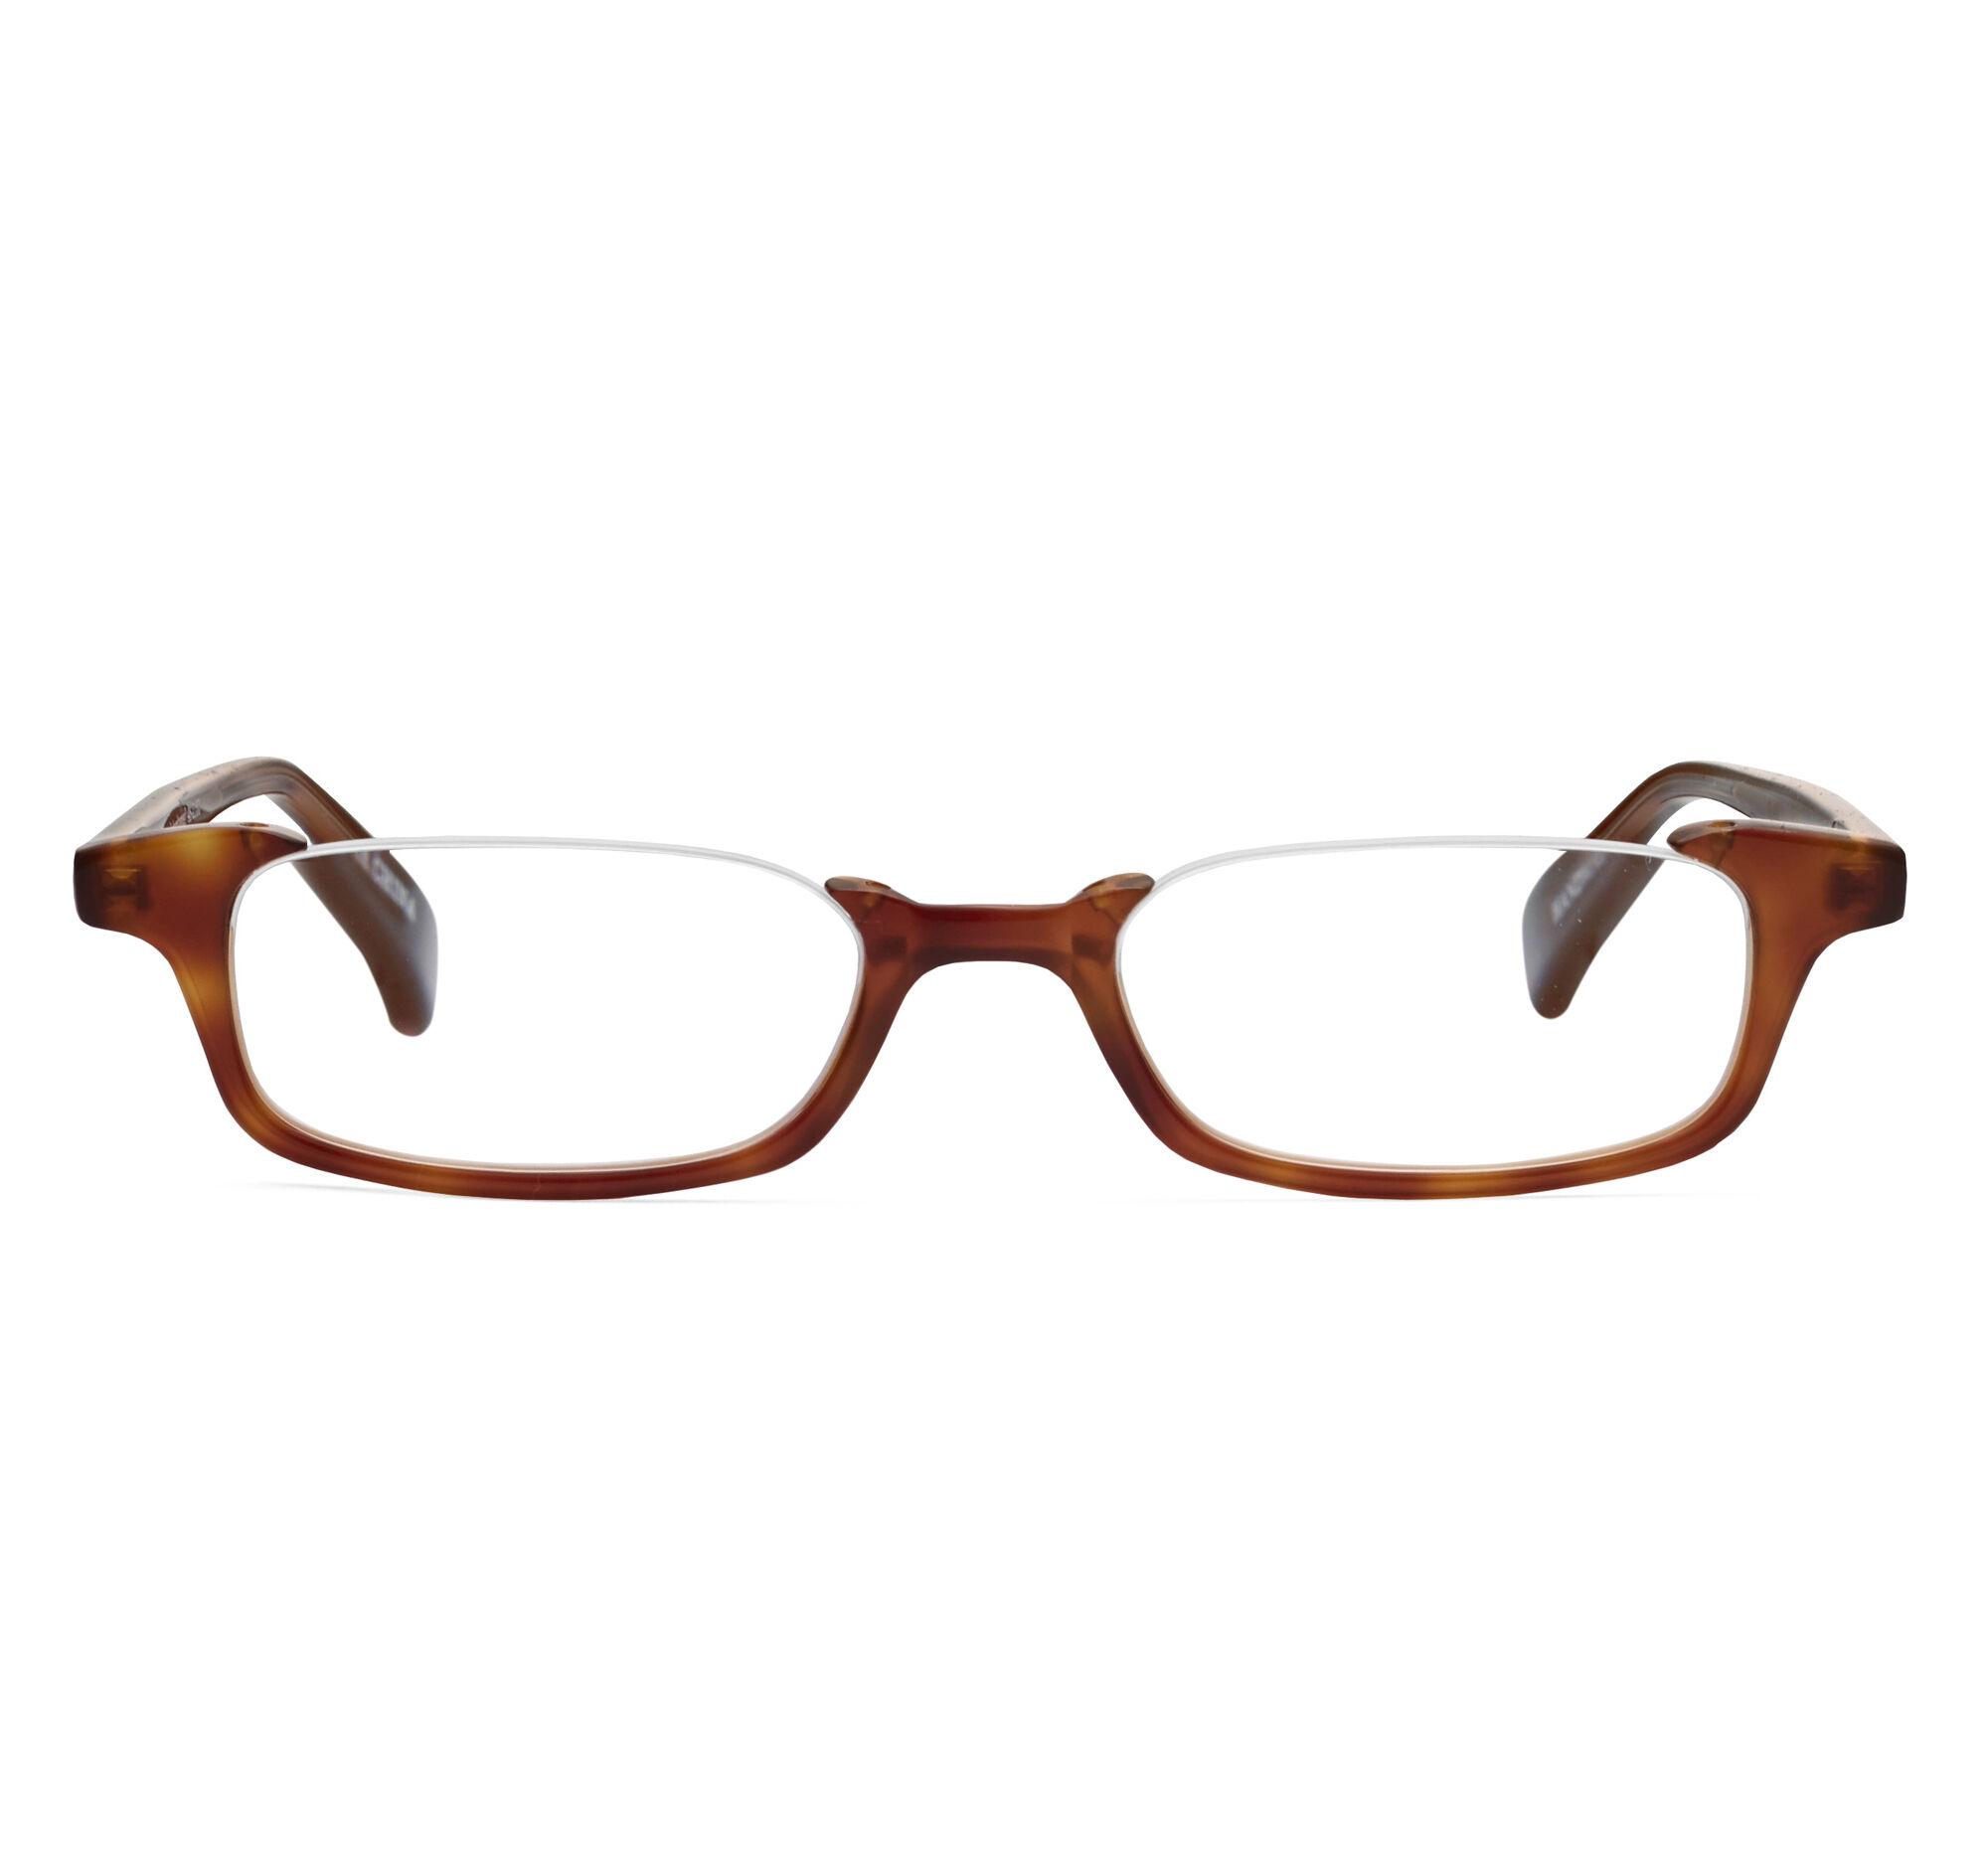 a78659a3943a Rectangle half rim readers johnston murphy jpg 2000x1884 Under rim glasses